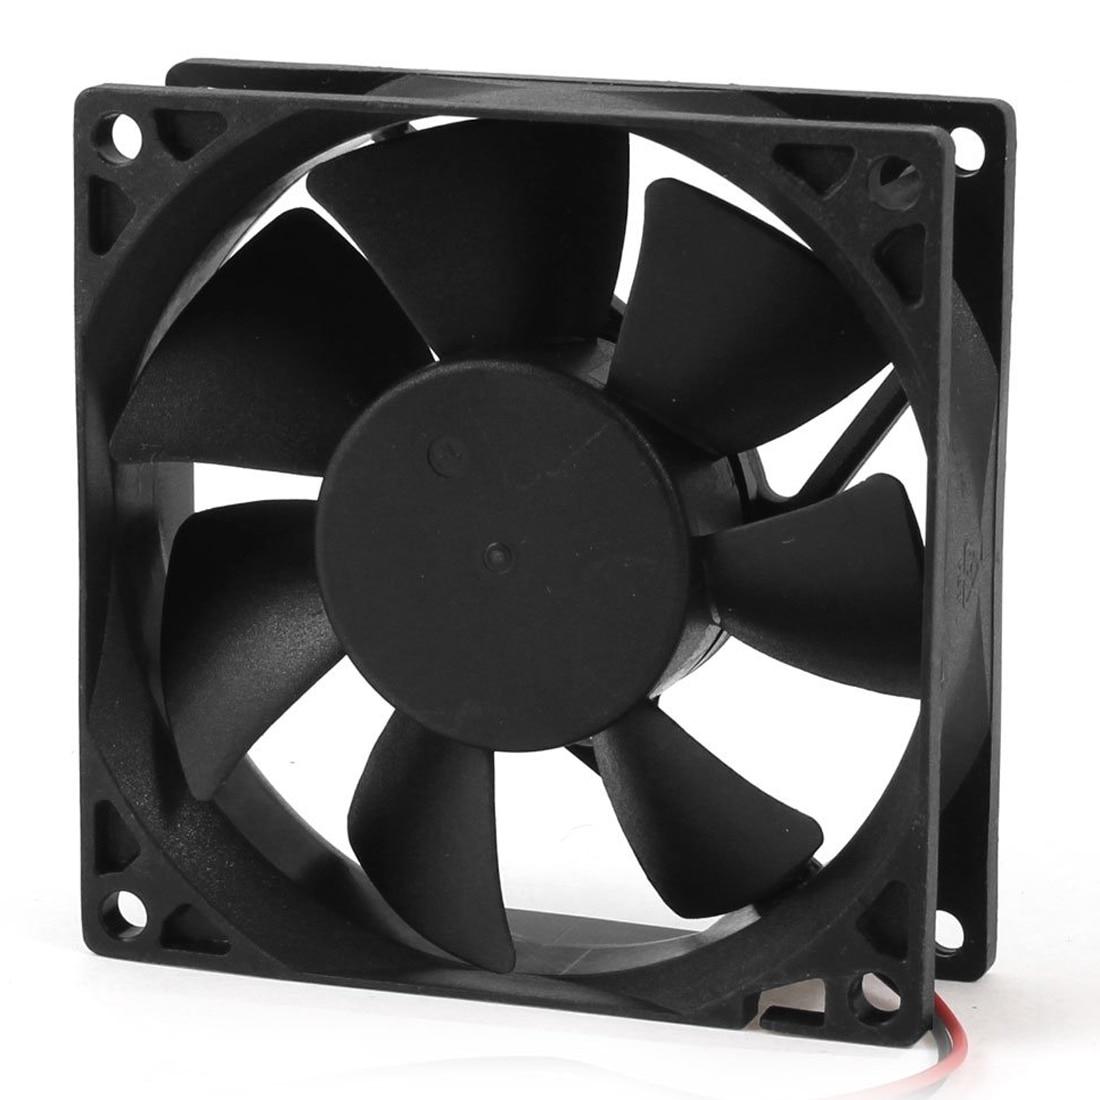 80mm DC 12V 2pin PC Computer Desktop Case CPU Cooler Cooling Fan 92mm x 25mm dc 12v 2pin 65 01cfm computer case cpu cooler cooling fan